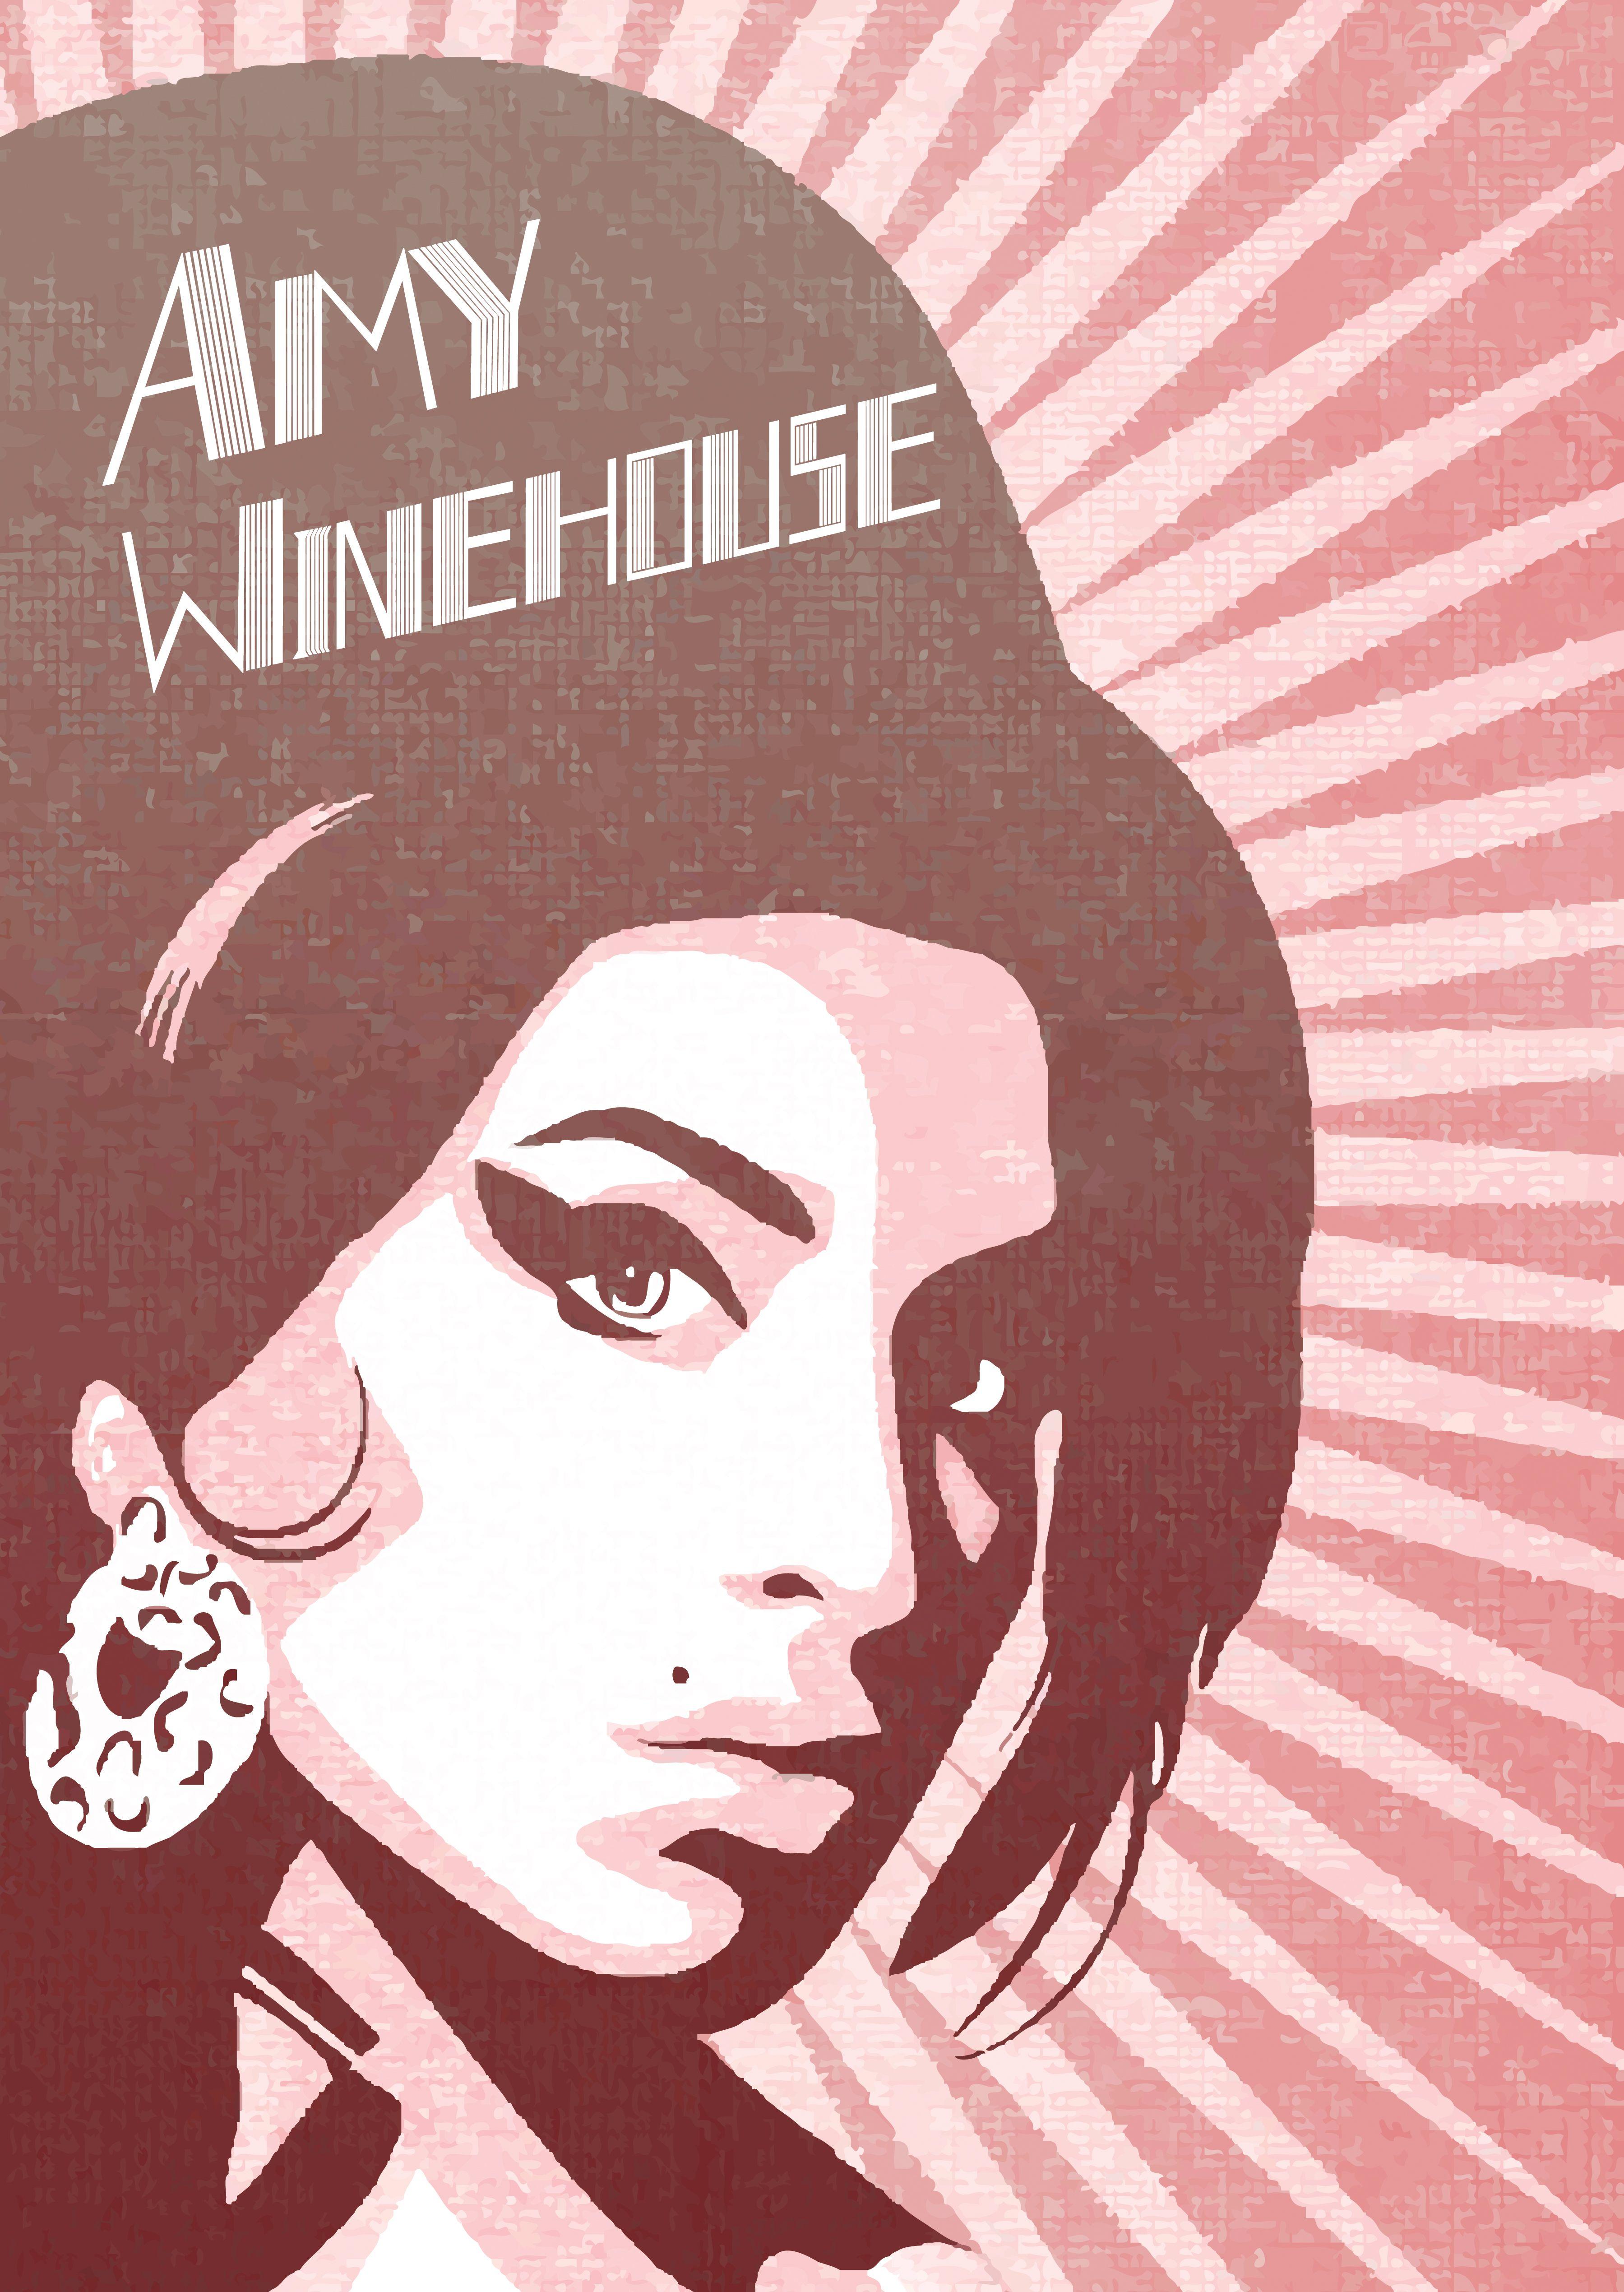 Poster Amy Winehouse Idolo Jpg 3599 5078 Amy Winehouse Poster Prints Pop Art